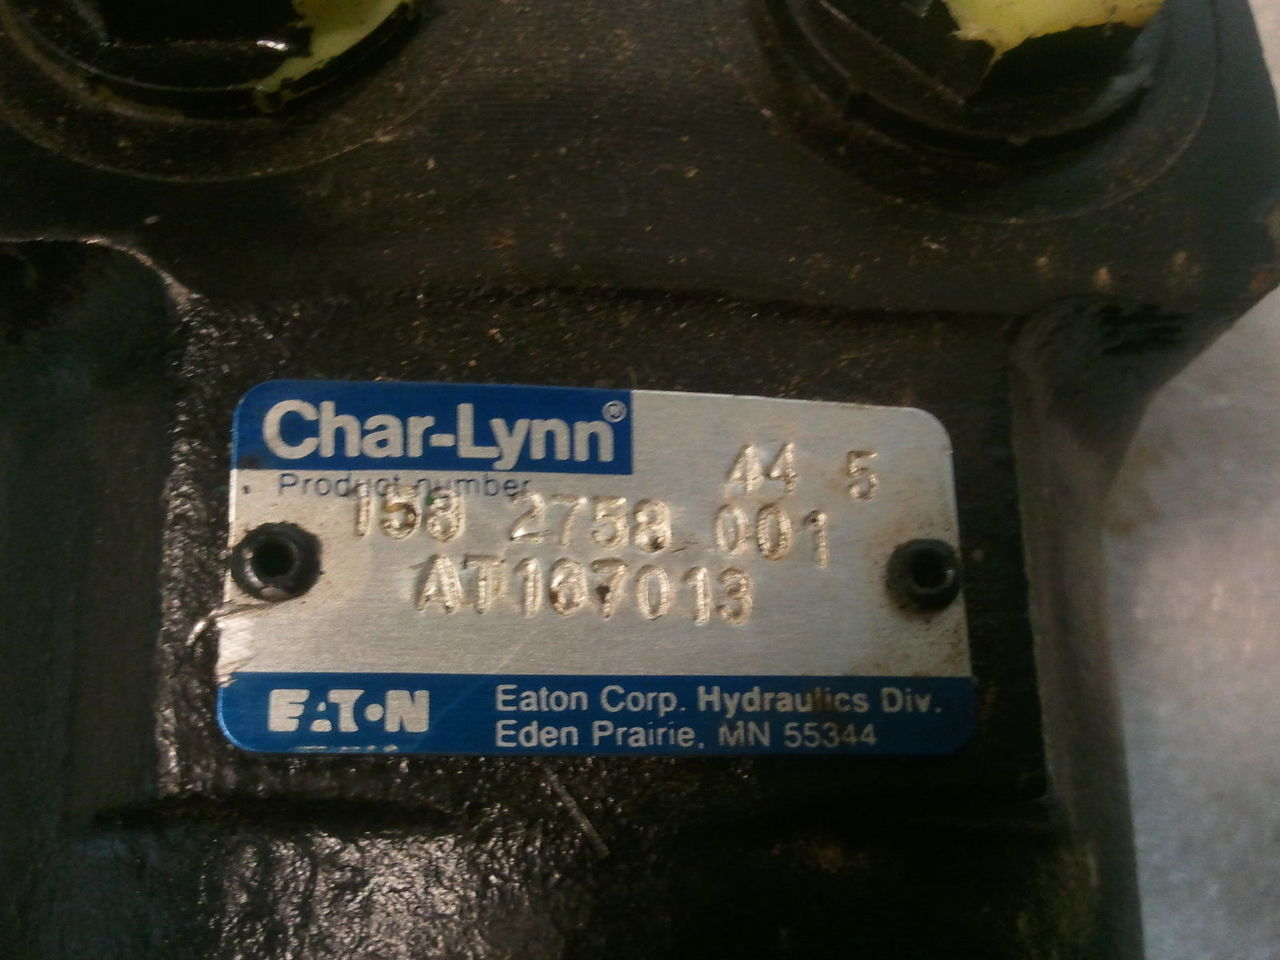 Char Lynn At167013 Hydraulic Motor John Deere S 1 6 Ebay